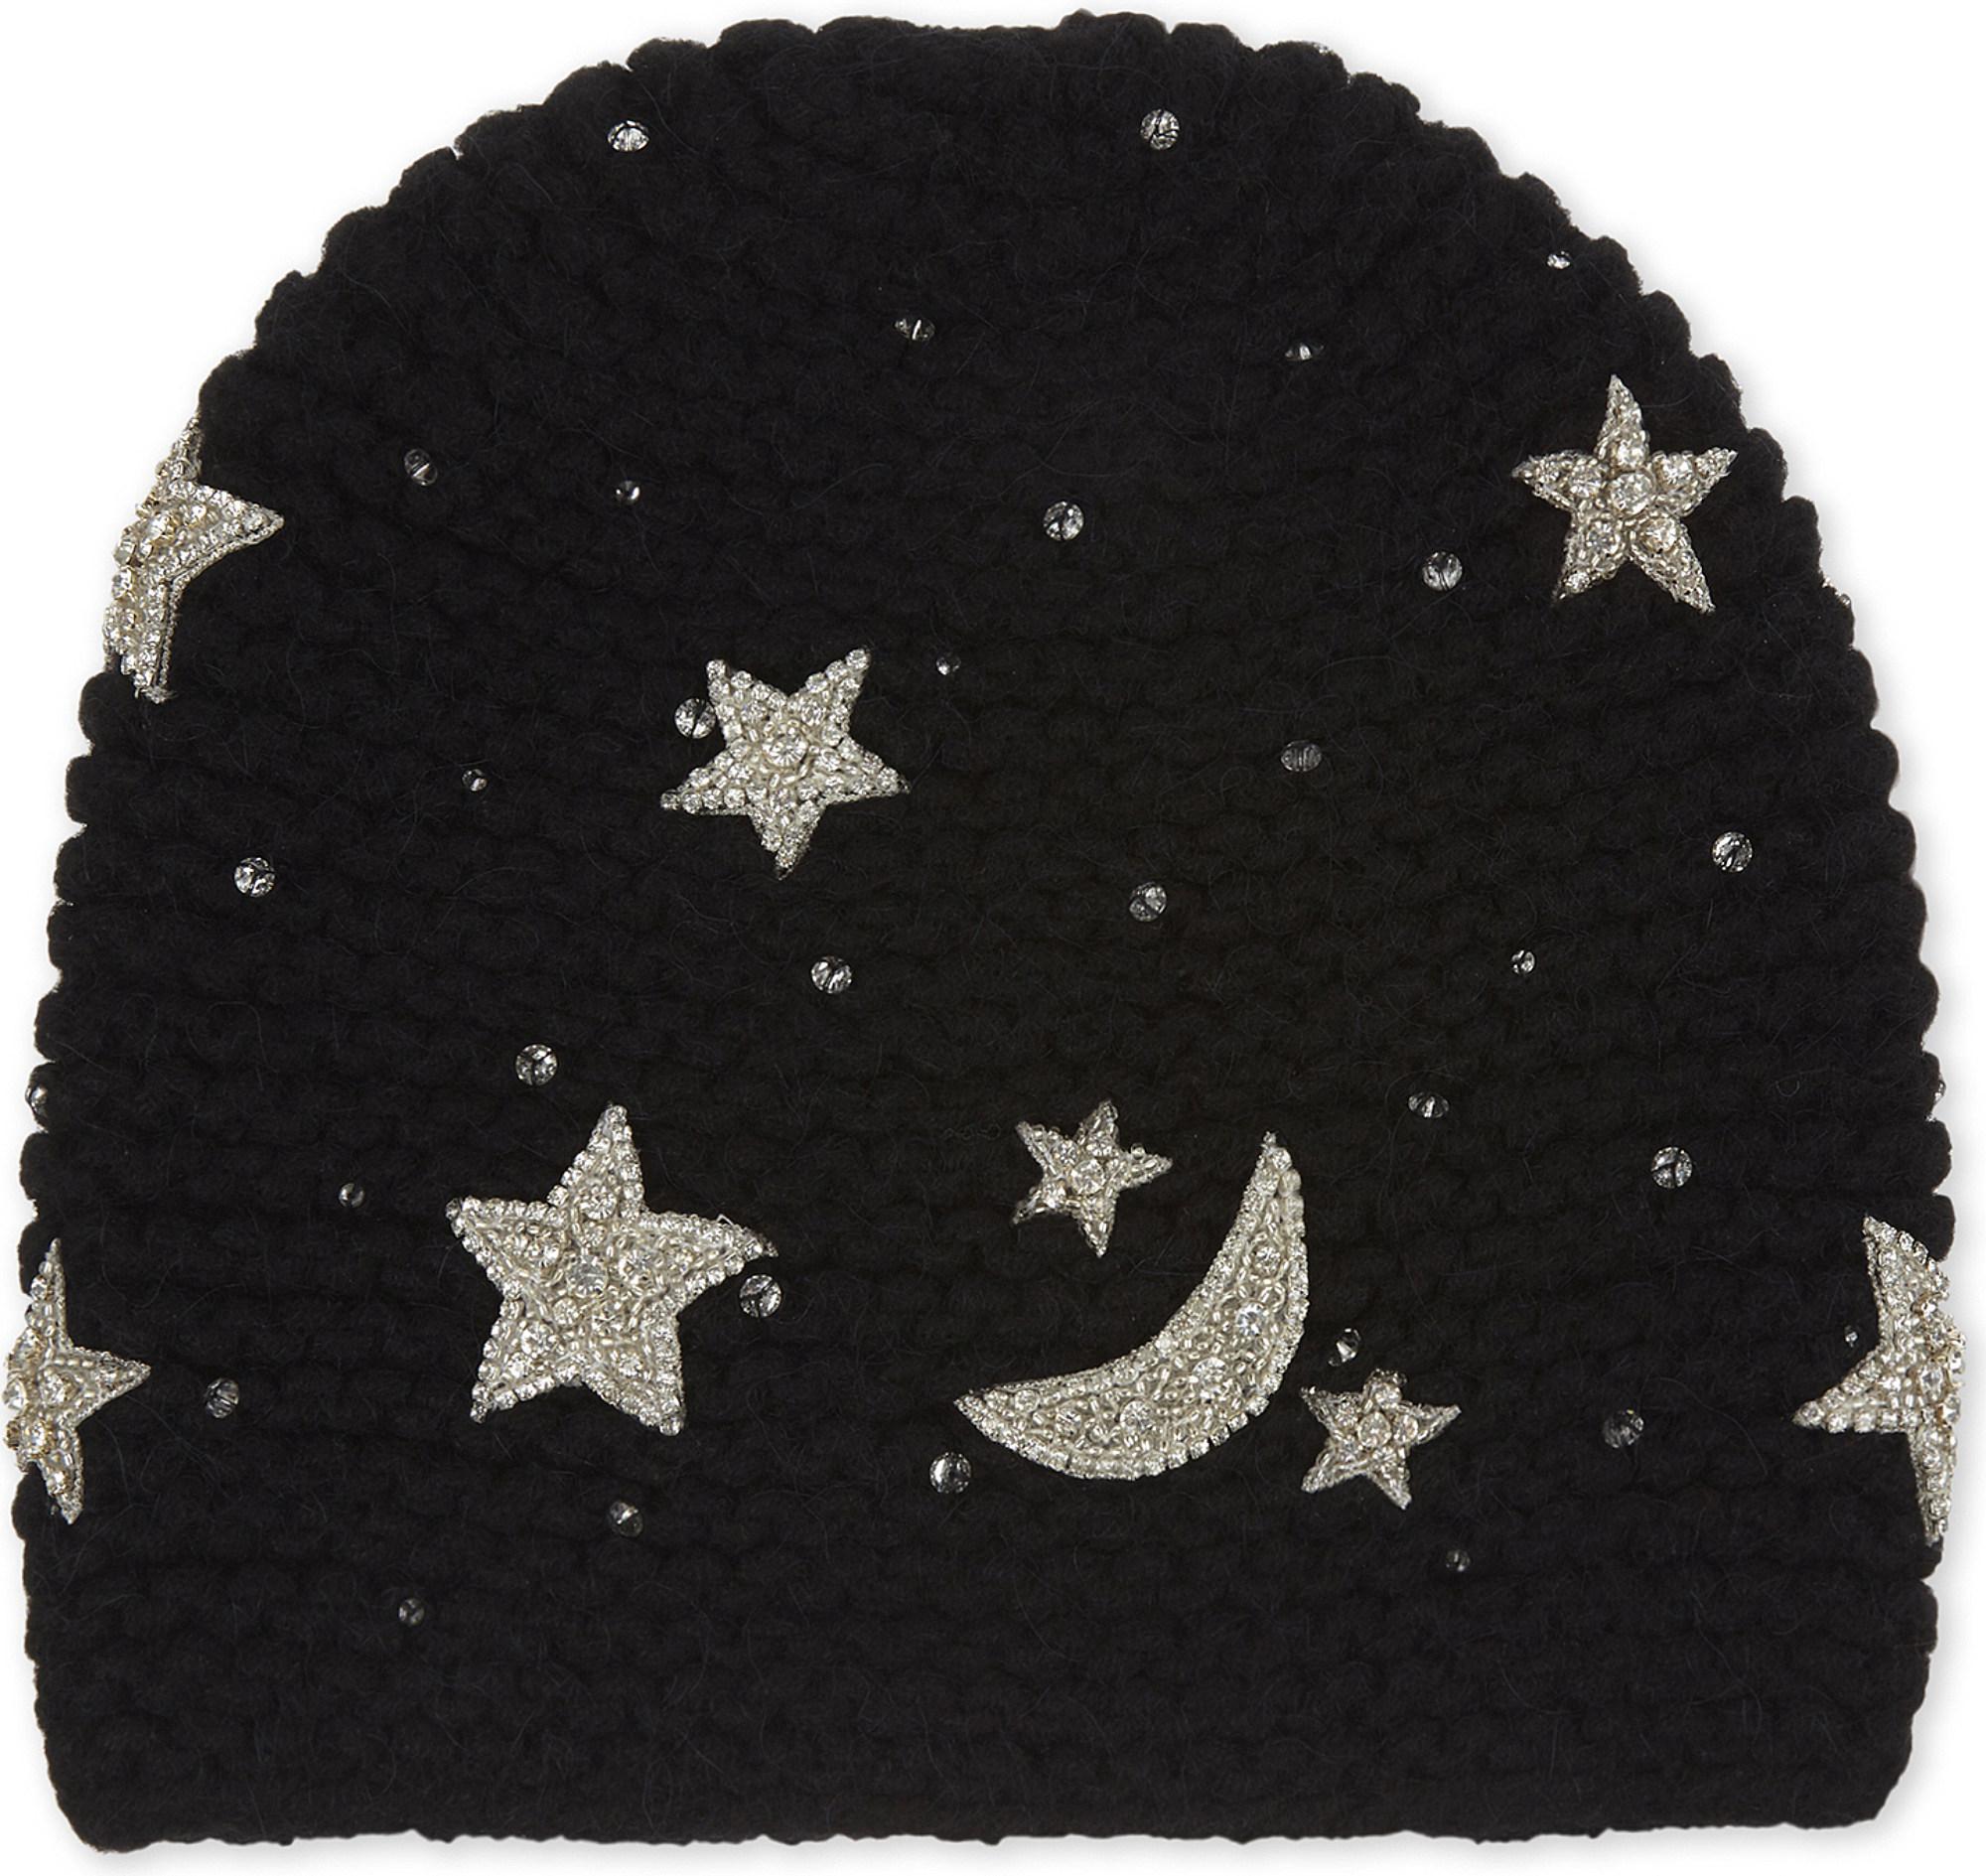 ce0ec9b11ca Lyst - Jennifer Behr Luna Embellished Star Beanie in Black